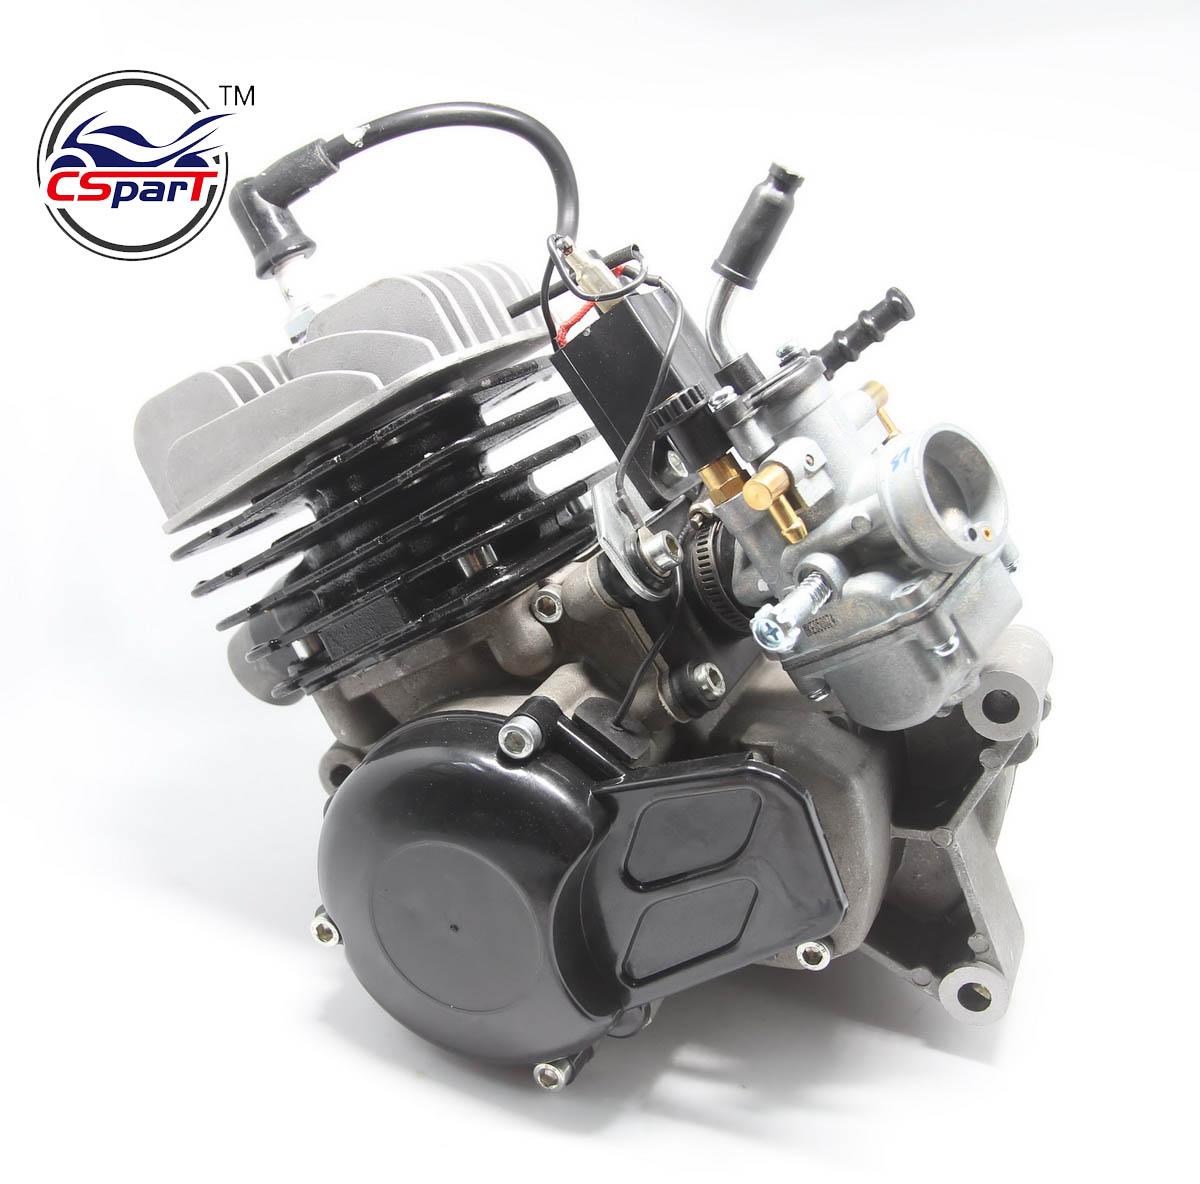 49CC Air Cooled Engine For KTM 50 SX 50 SX PRO SENIOR Dirt Pit Cross Bike With Carburetor